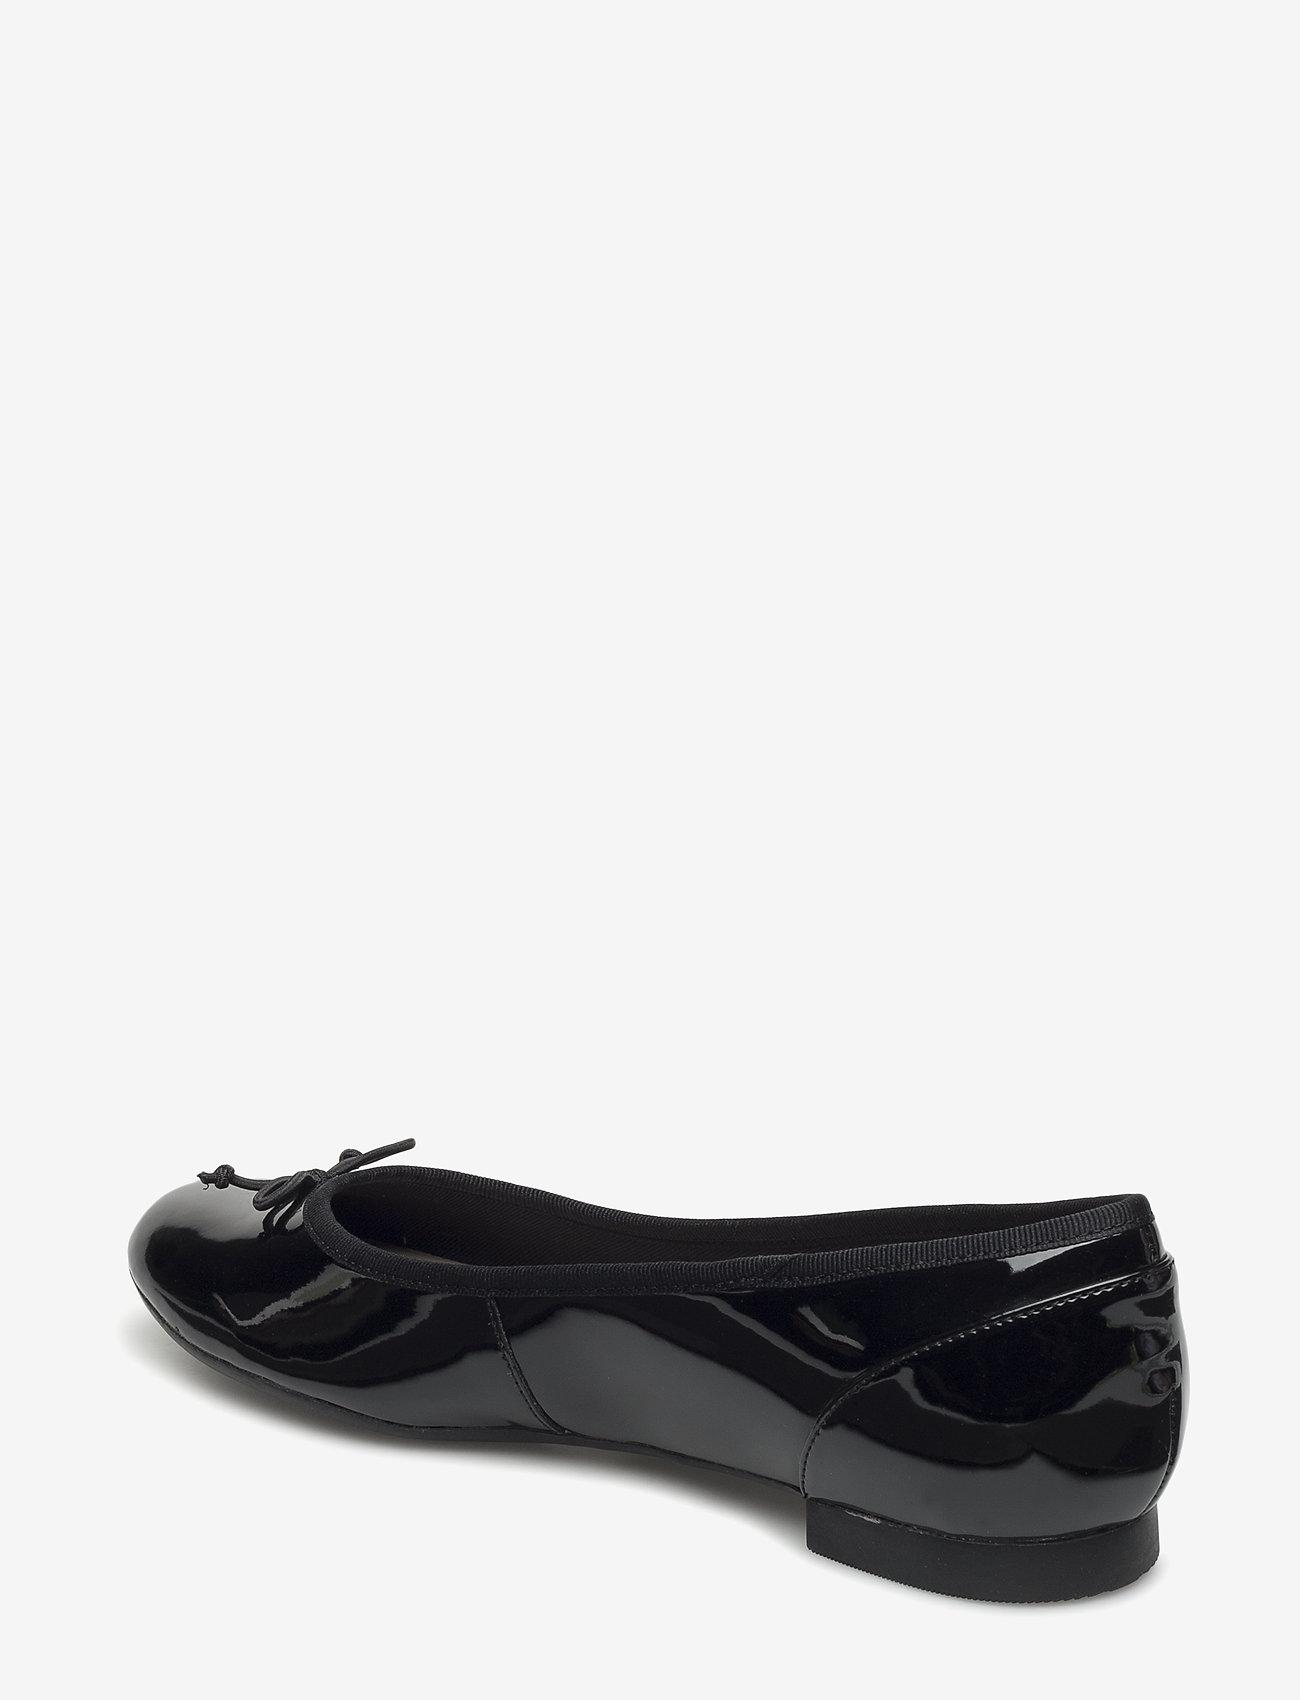 Clarks - Couture Bloom - ballerinas - black pat - 1